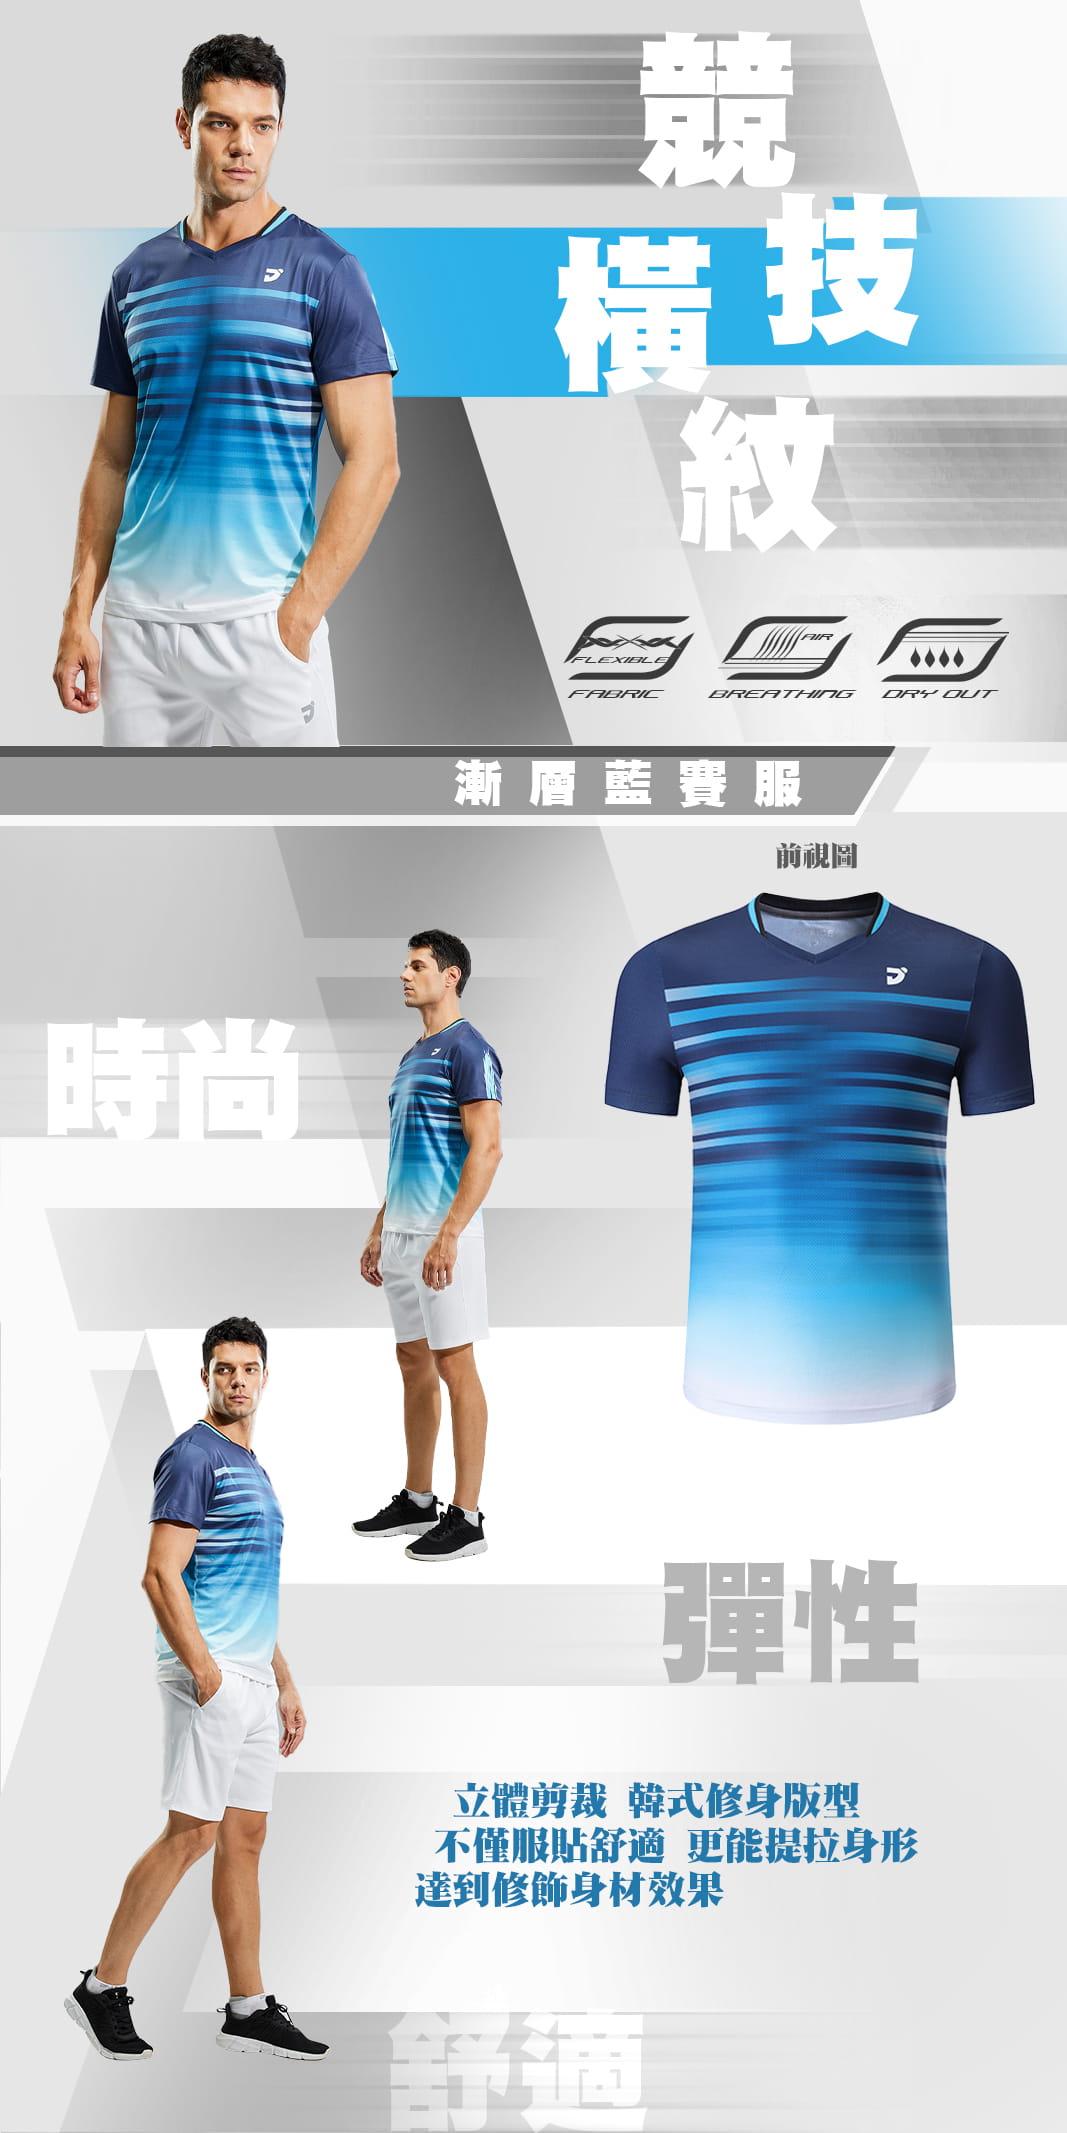 【JNICE】簡約橫紋競技賽服-漸層藍 1